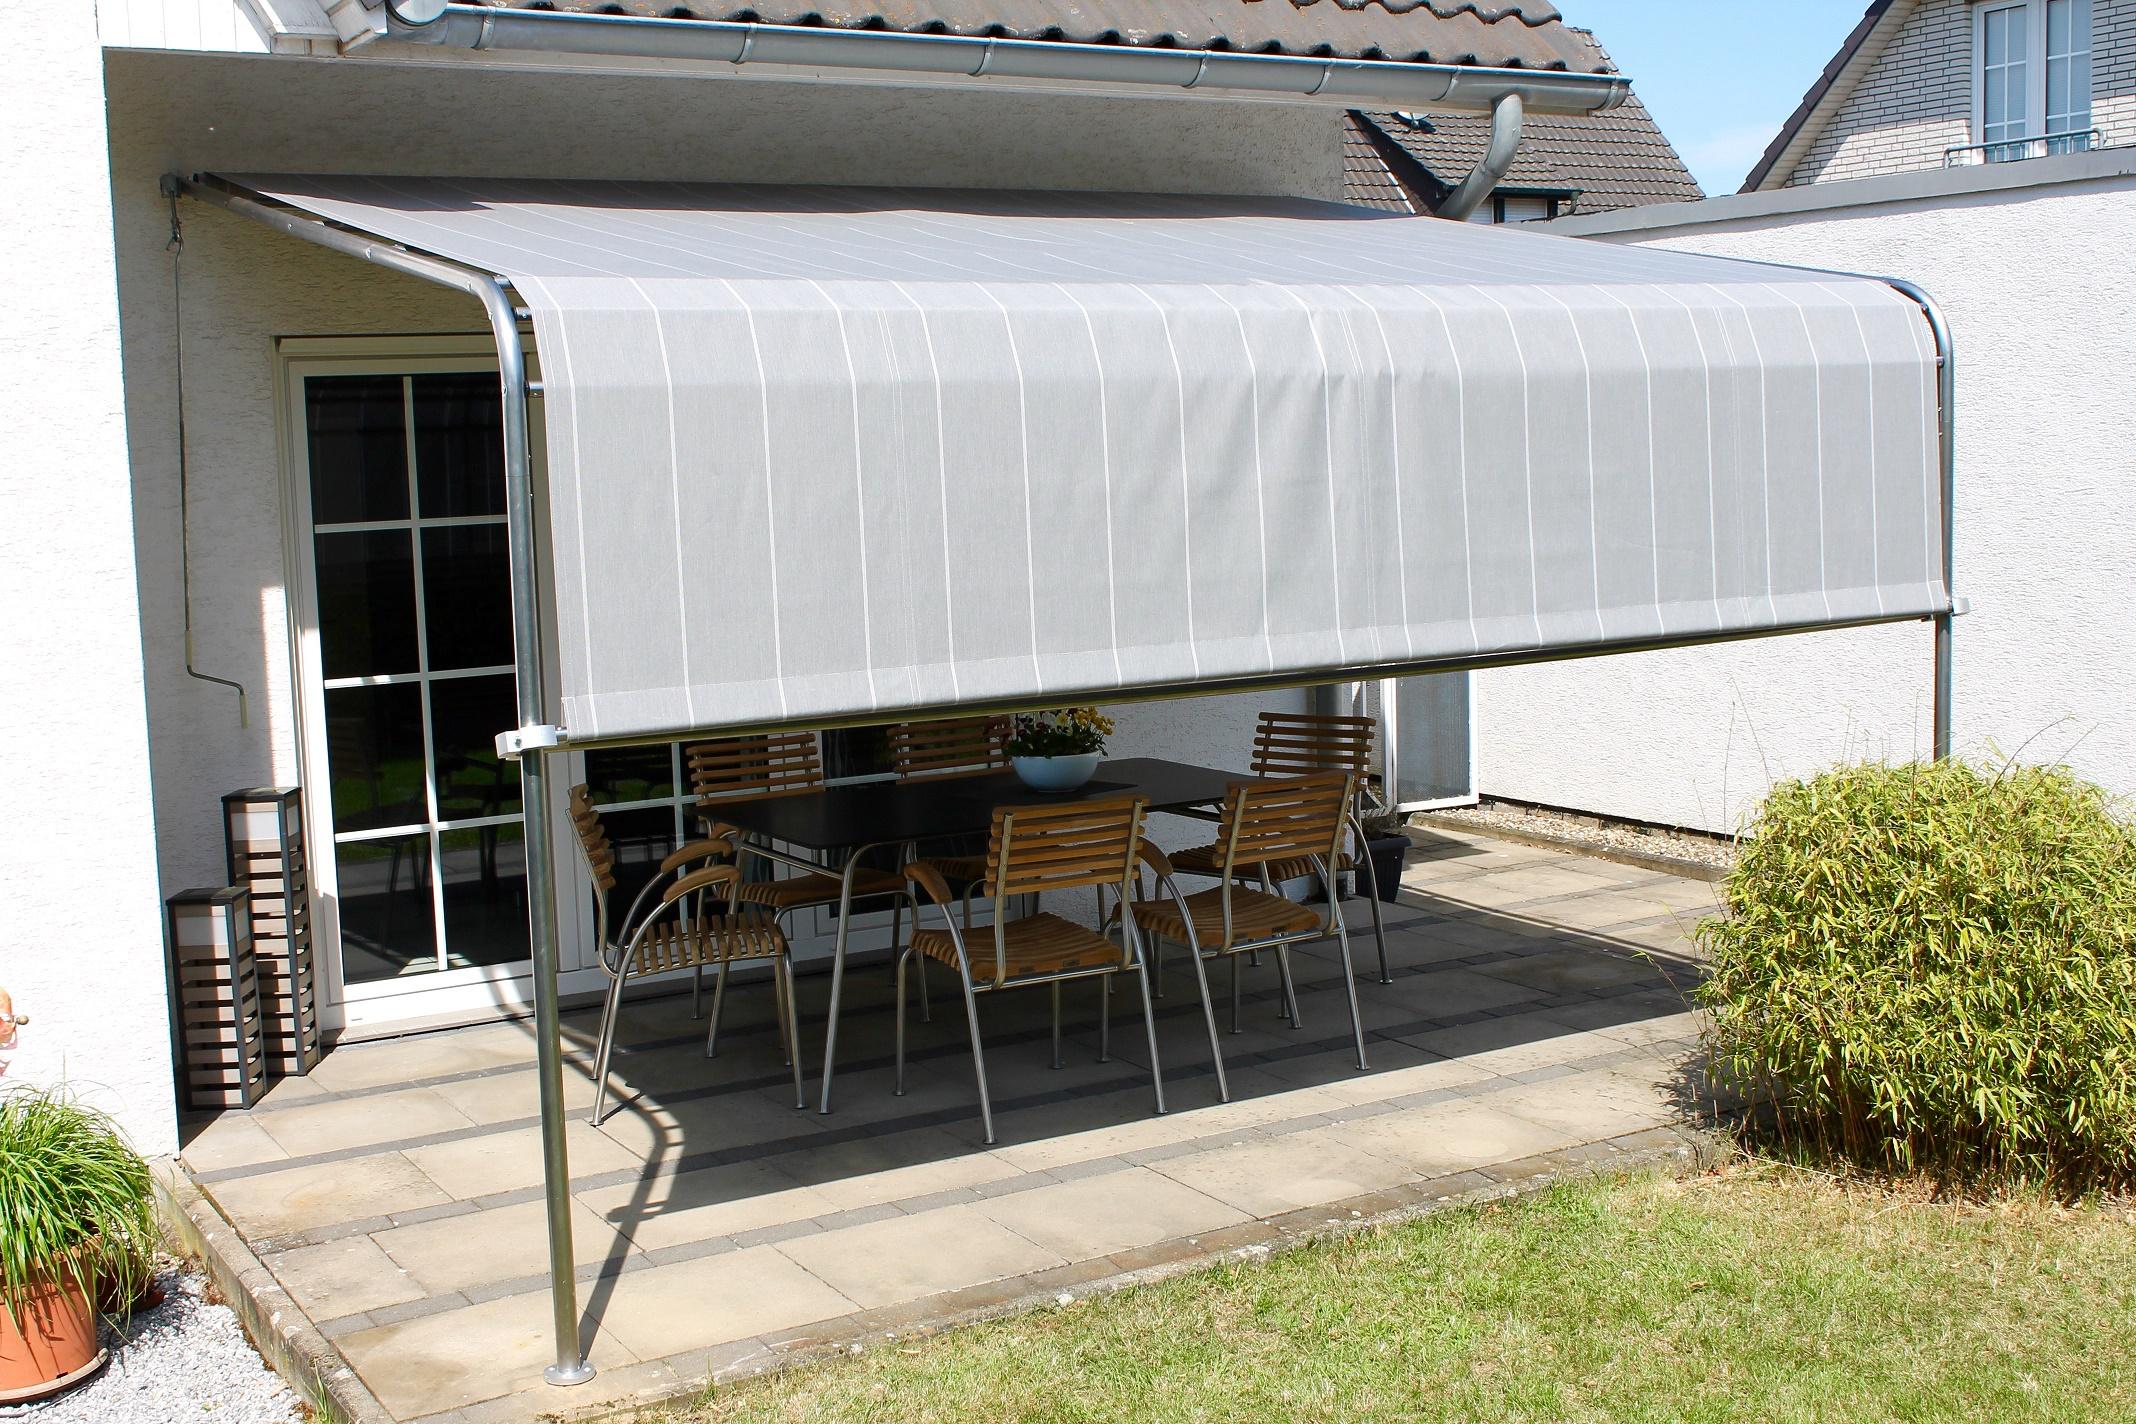 leco terrassenuberdachung 300x400 terrasse uberdachung markise sonnenschutz grau